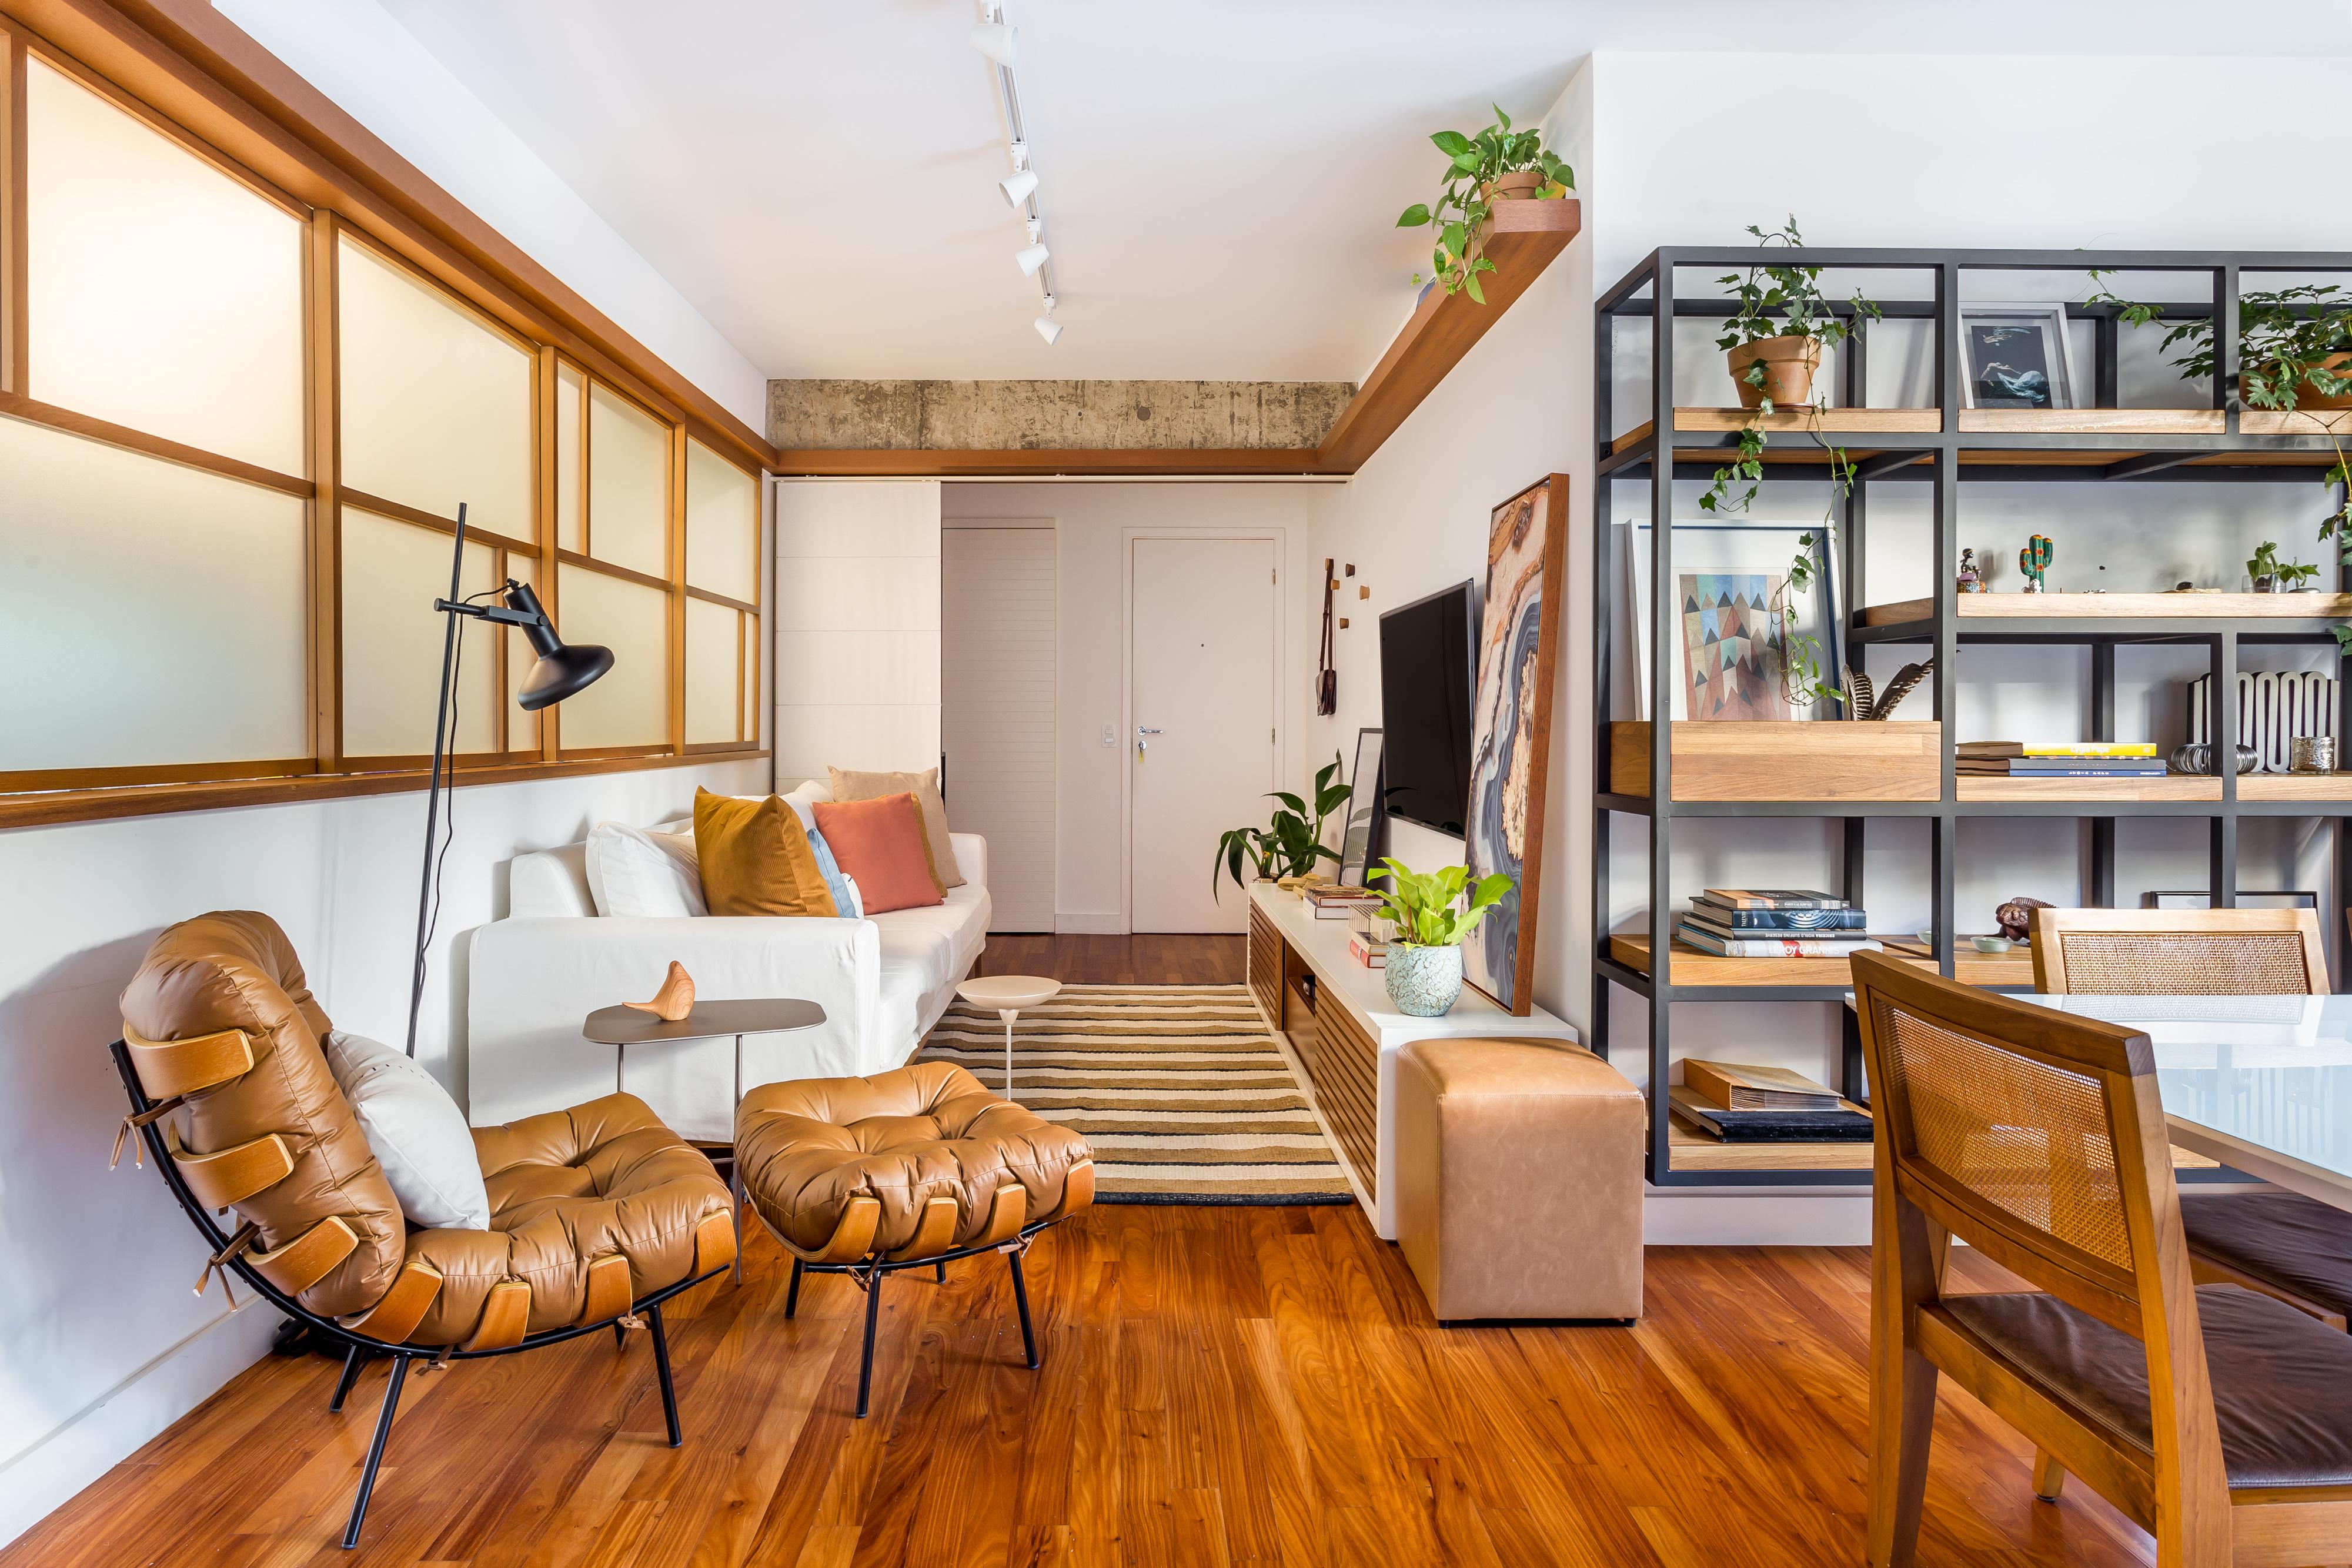 Sala de estar com piso de madeira e décor neutro, estante no estilo industrial, sofá branco e poltrona marrom